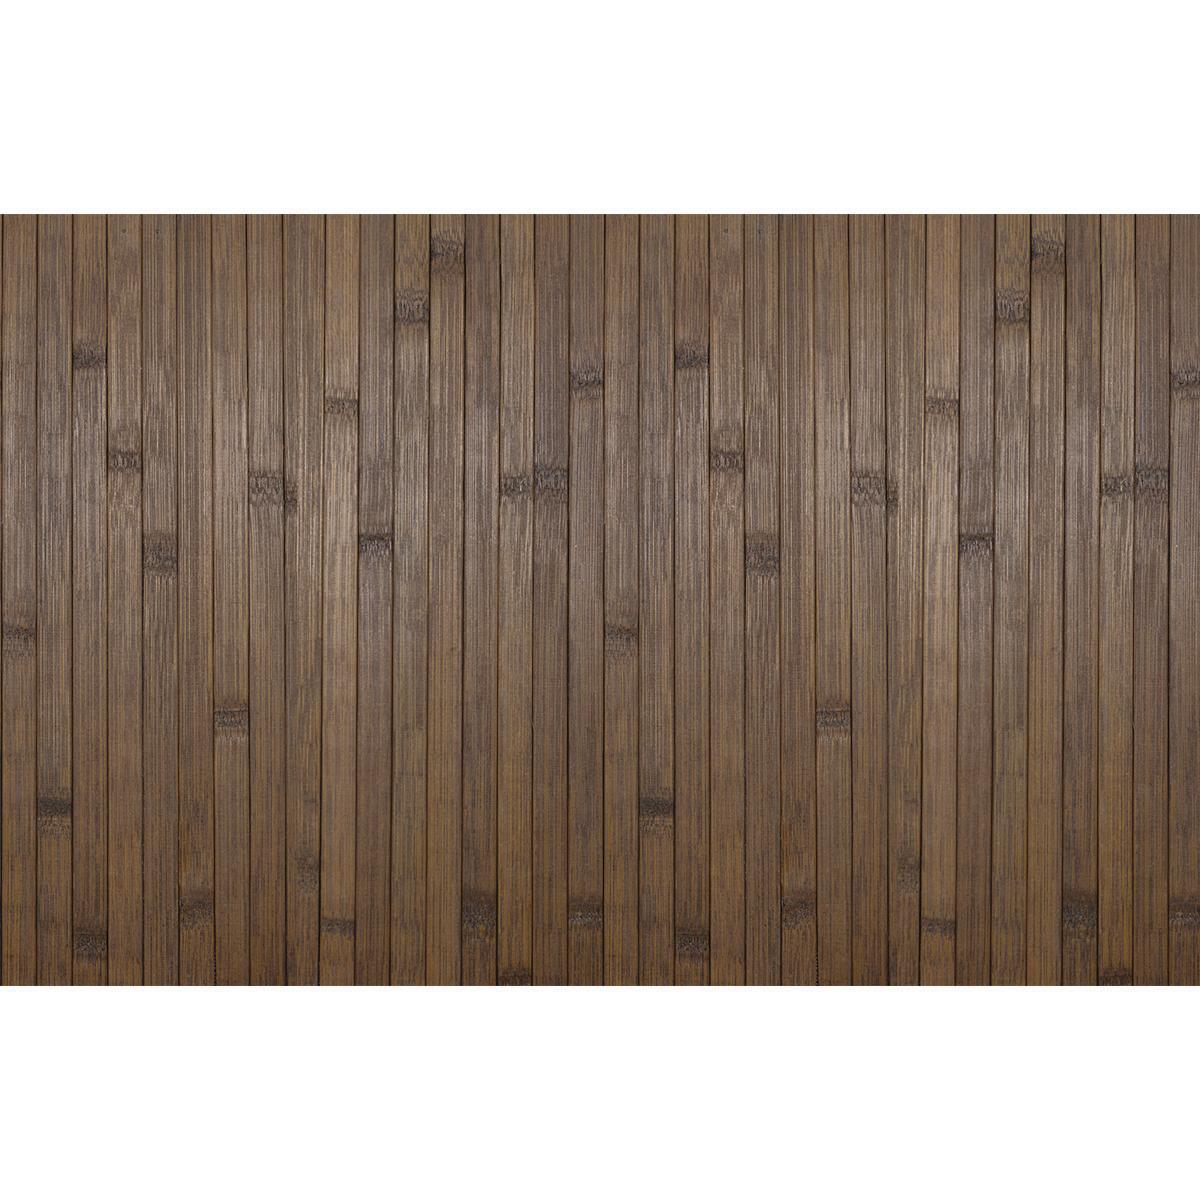 Passatoia Bamboo open , cioccolato, 50x240 - 2